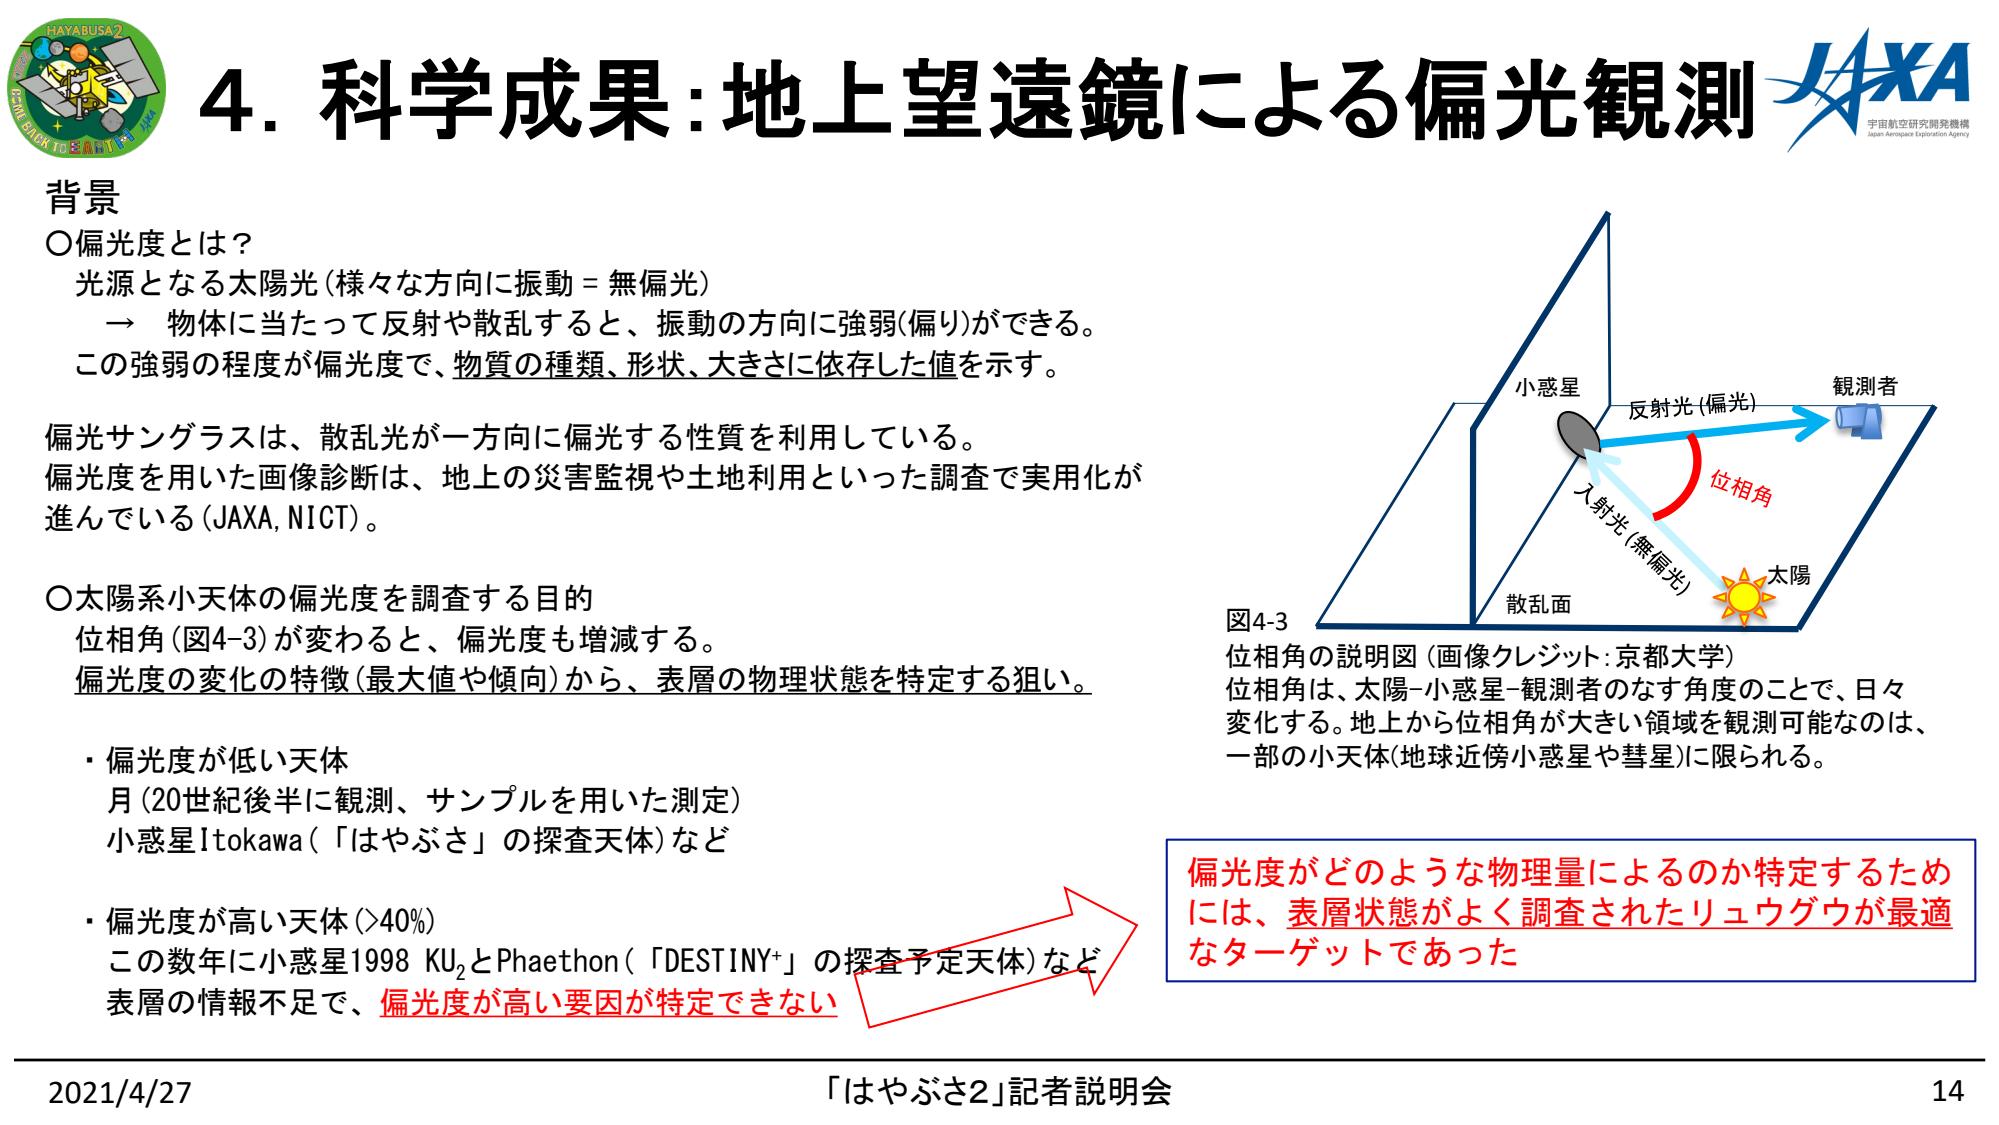 f:id:Imamura:20210427135222p:plain